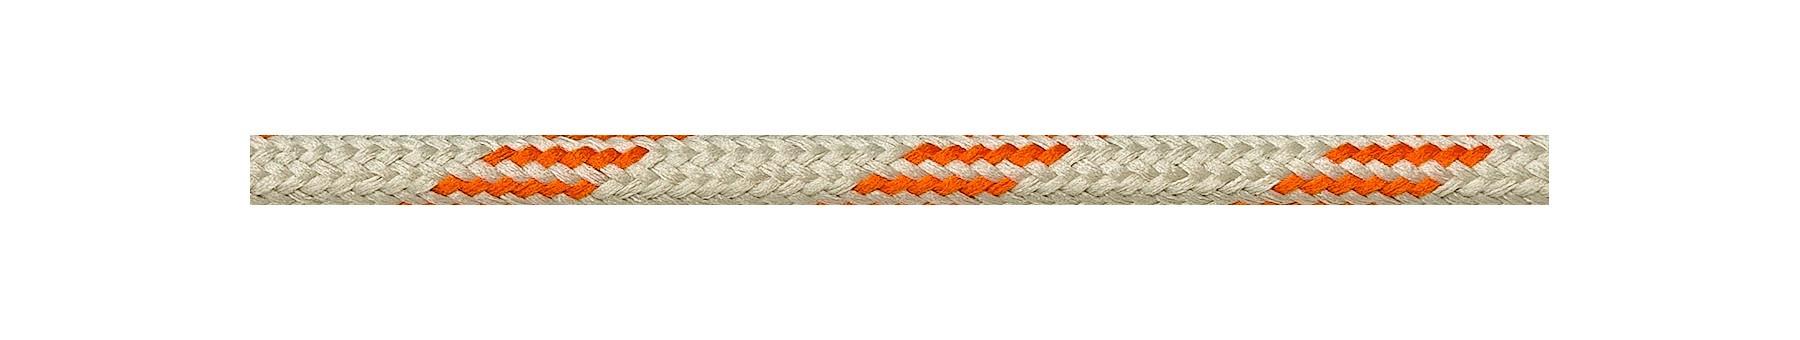 Textilkabel Orange-Beige